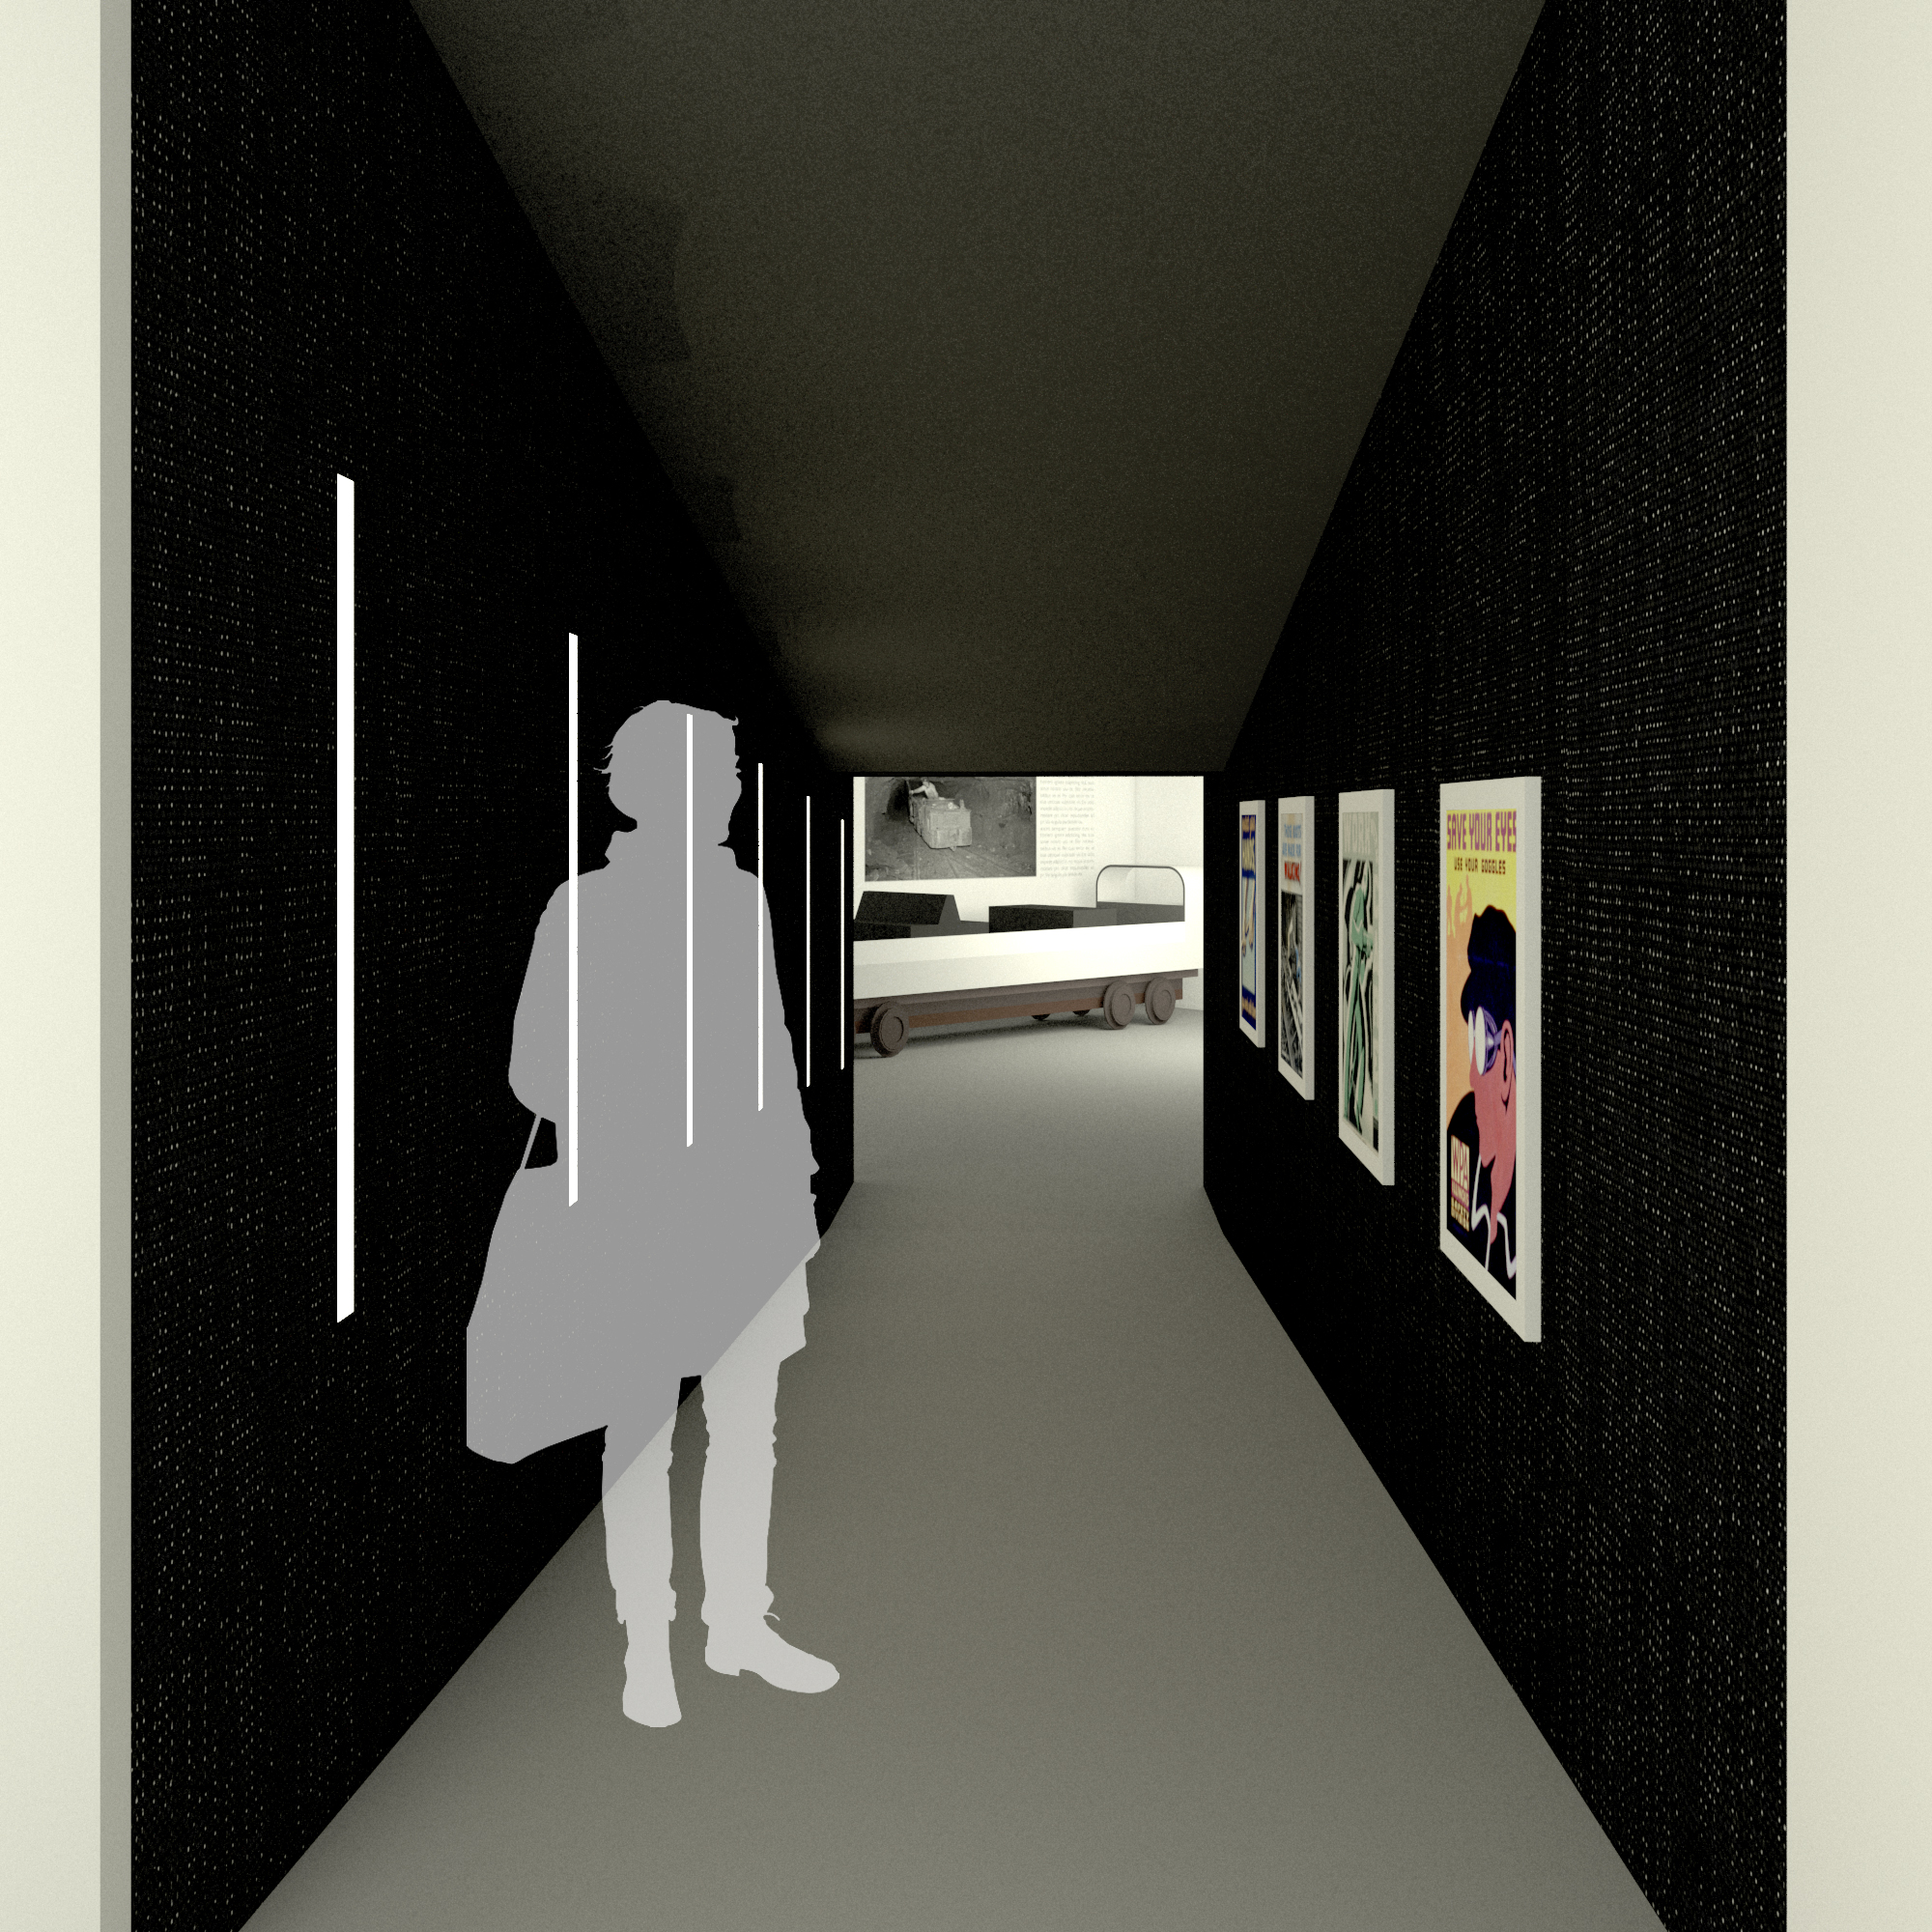 cole_miners_tunnel.jpg